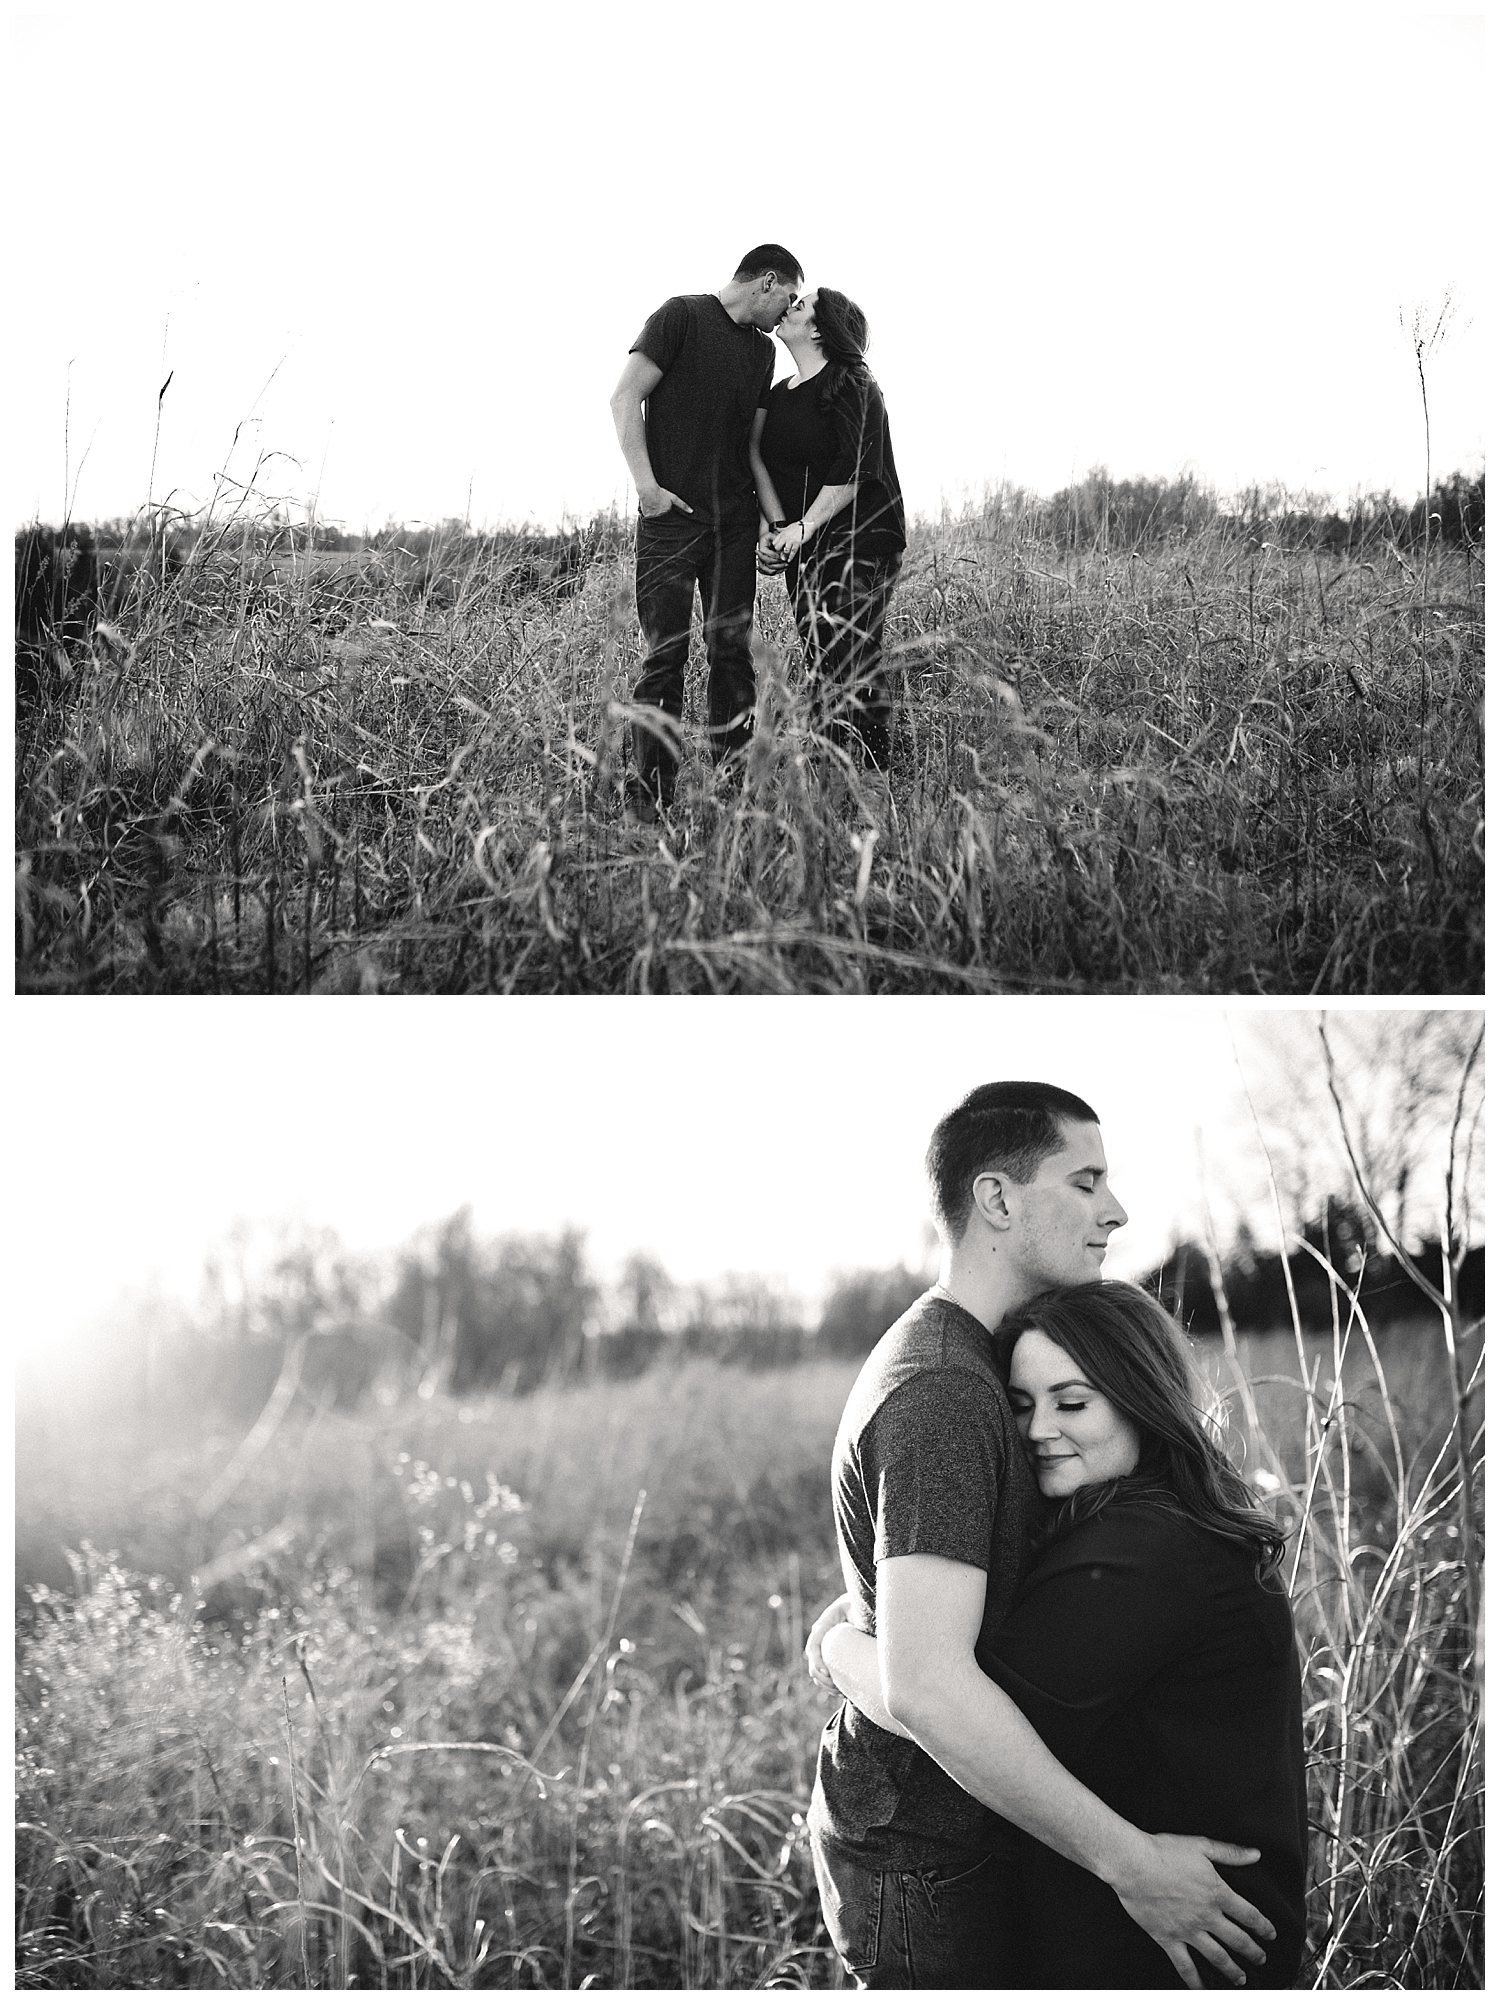 Kelsey_Diane_Photography_T-Bones_Stadium_Kansas_Wandering_Adventourus_Kansas_City_Engagement_0107.jpg